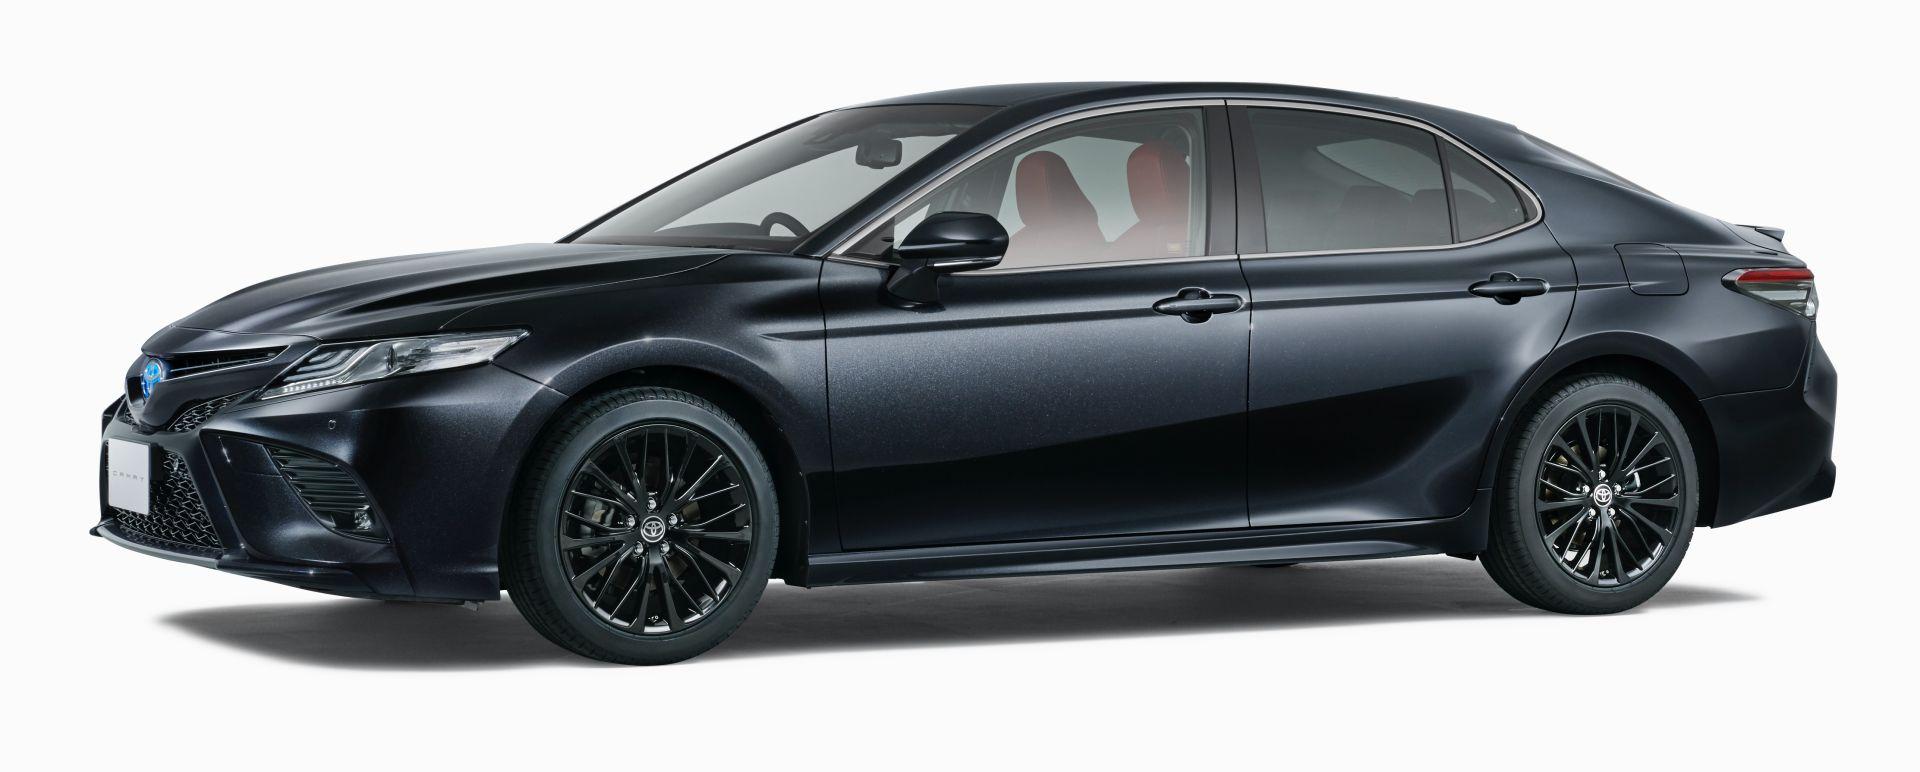 фото сбоку Toyota Camry WS Black Edition 2020—2021